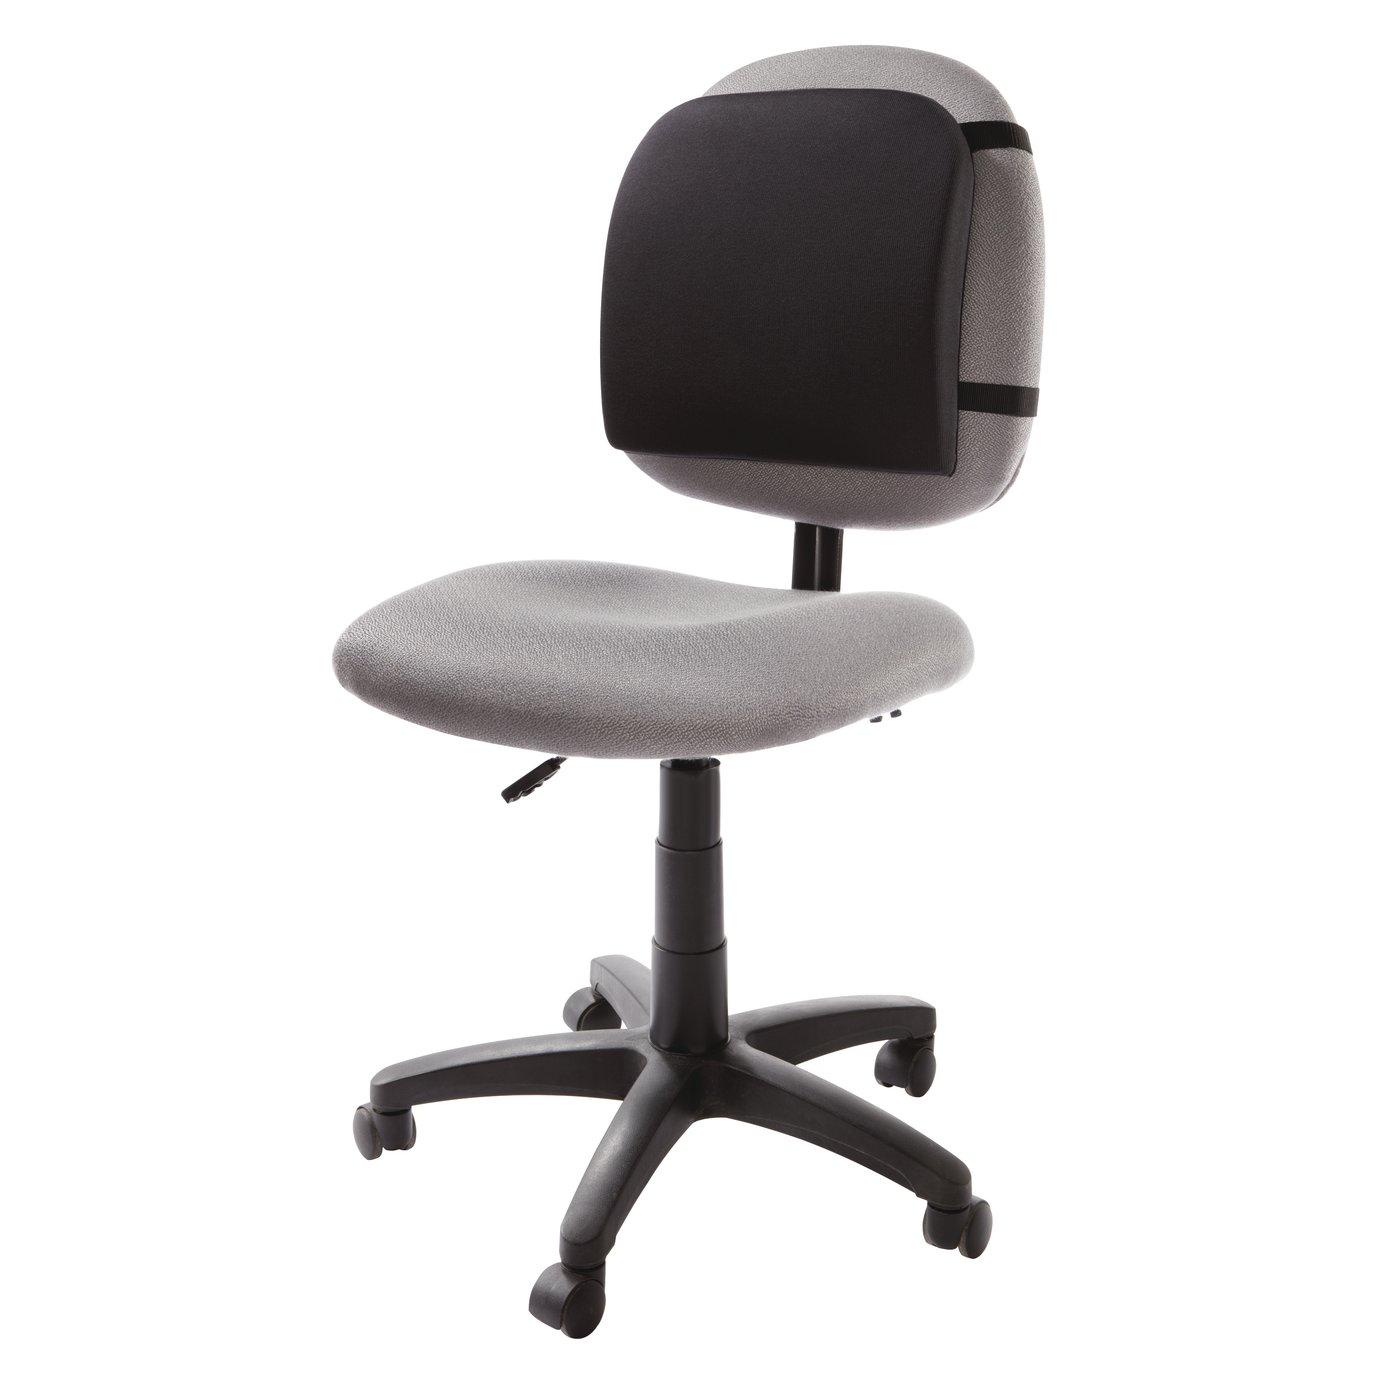 Kensington Products Ergonomics Foot Rests & Back Supports